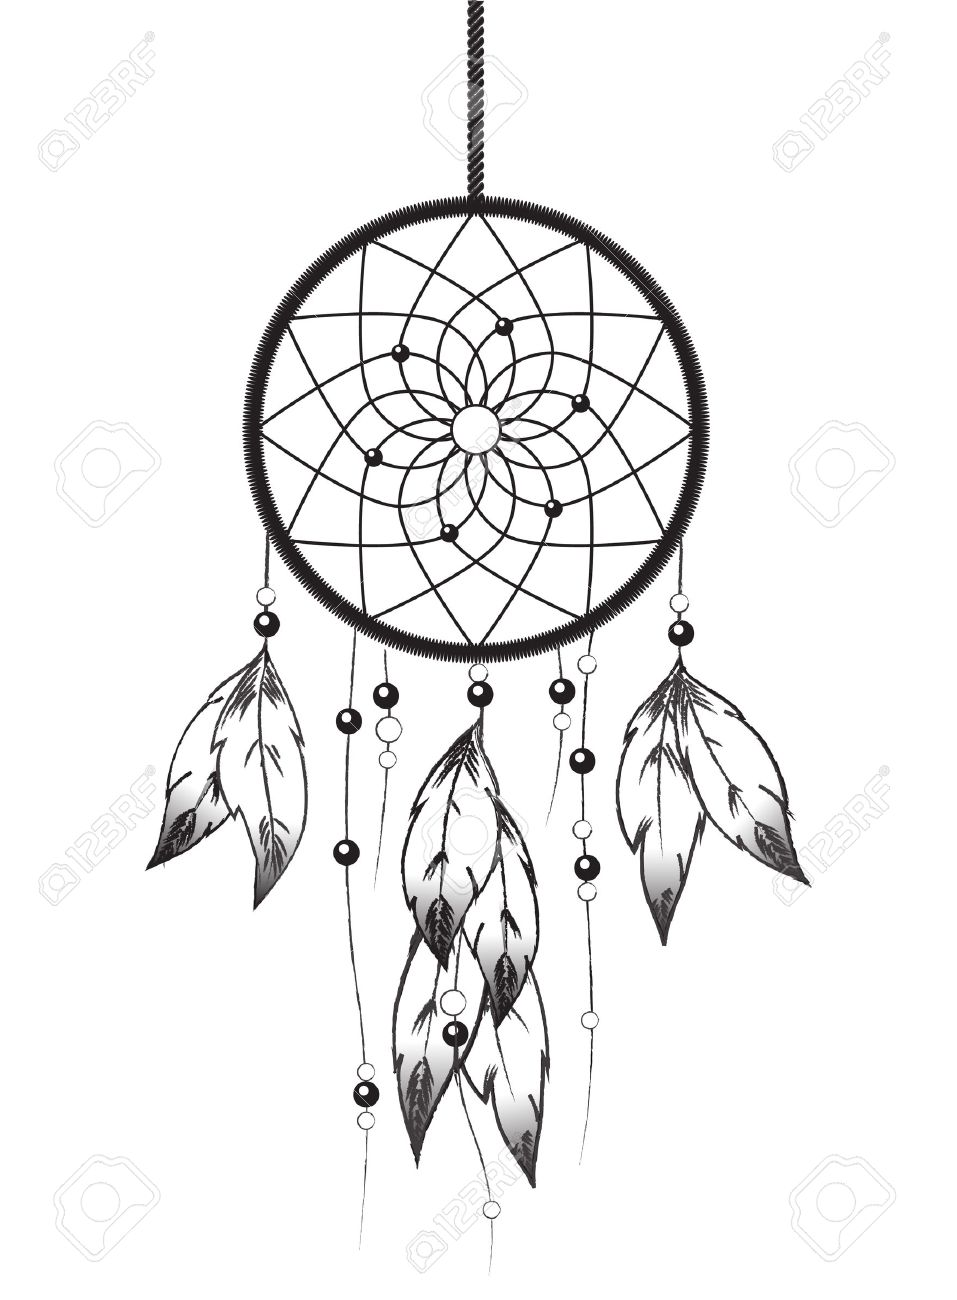 Black And White Illustration Of A Dreamcatcher Dream Catcher Art Dream Catcher Drawing Dream Catcher Tattoo Design